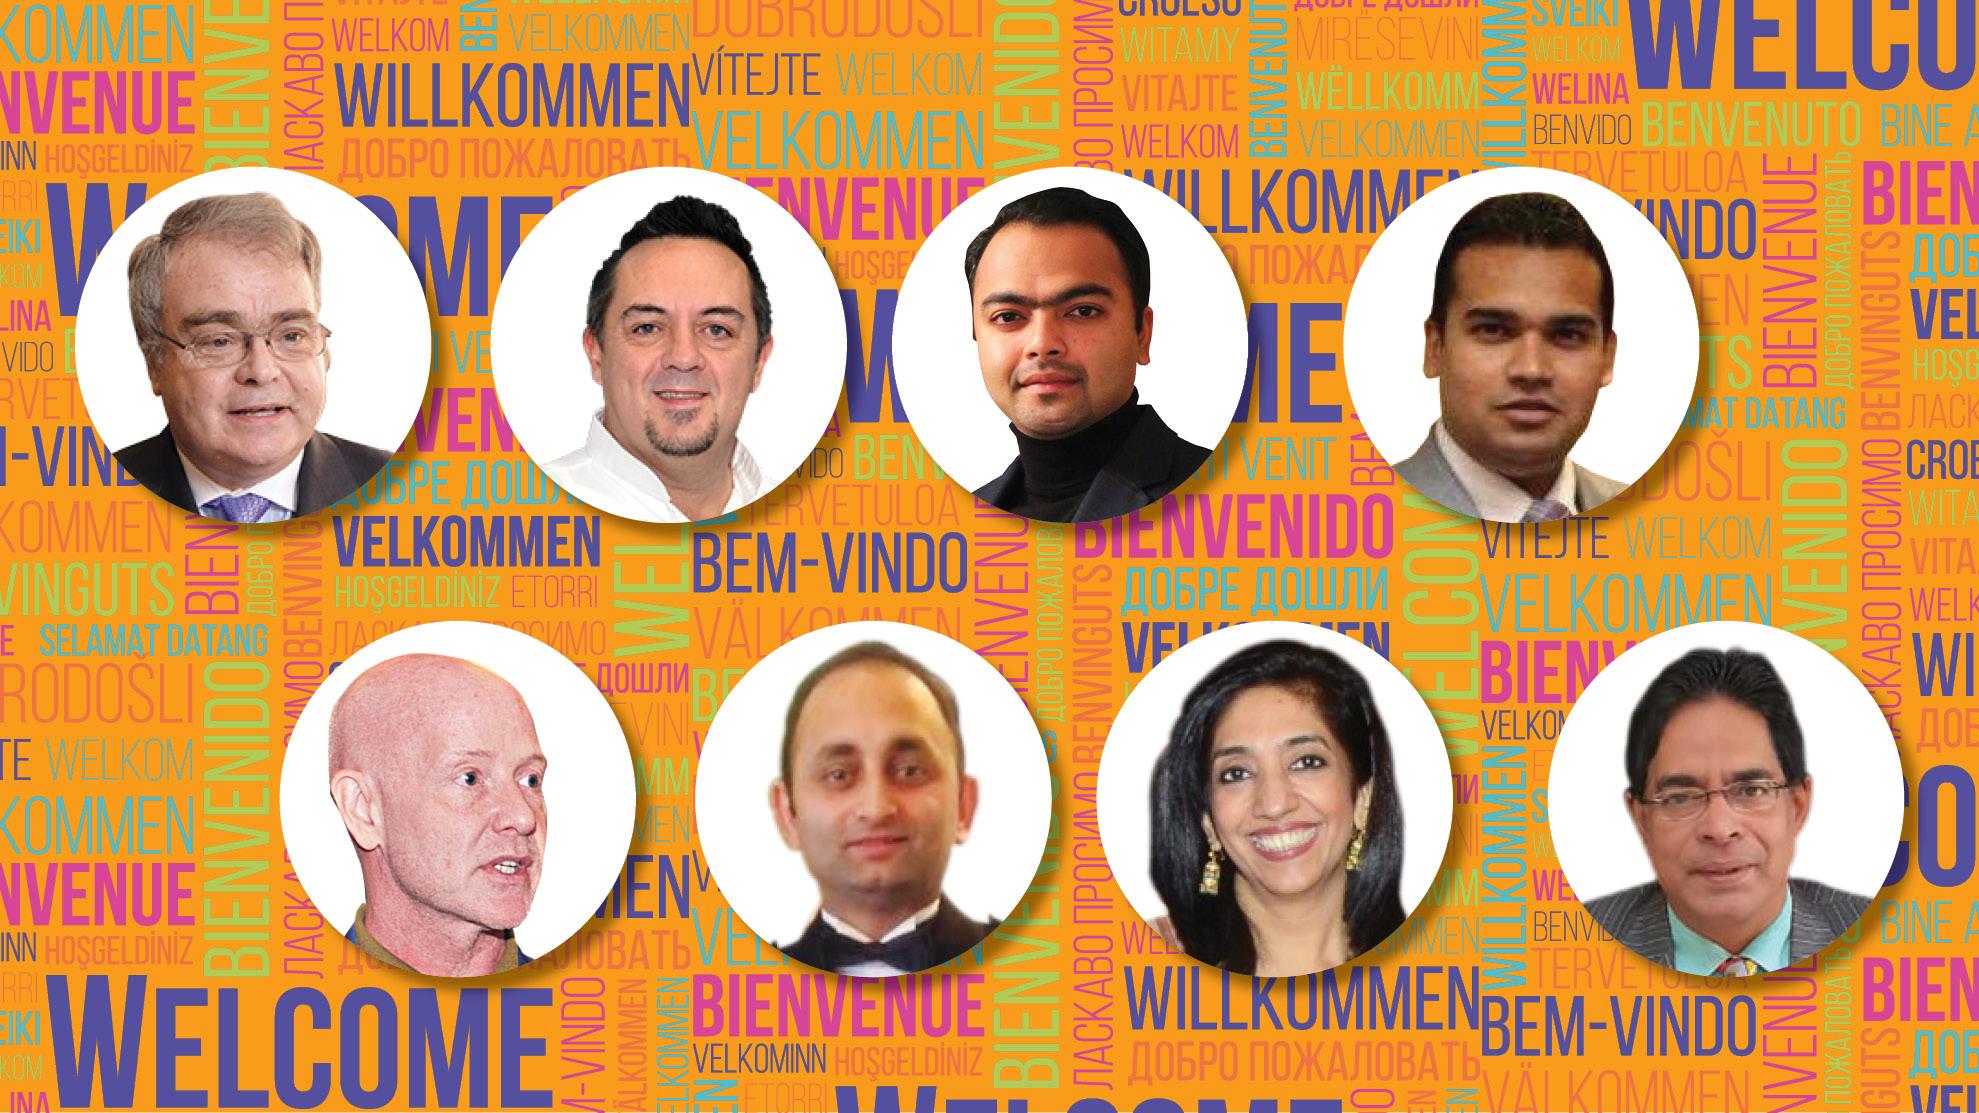 (First row, from left) David Foskett, Shaun Kenworthy, Syed Jeff Hussain and Sarfaraz Alam. (Second row, from left) Keith W. Edgar, Awinash Kumar, Ritu Jolly and Suborno Bose.